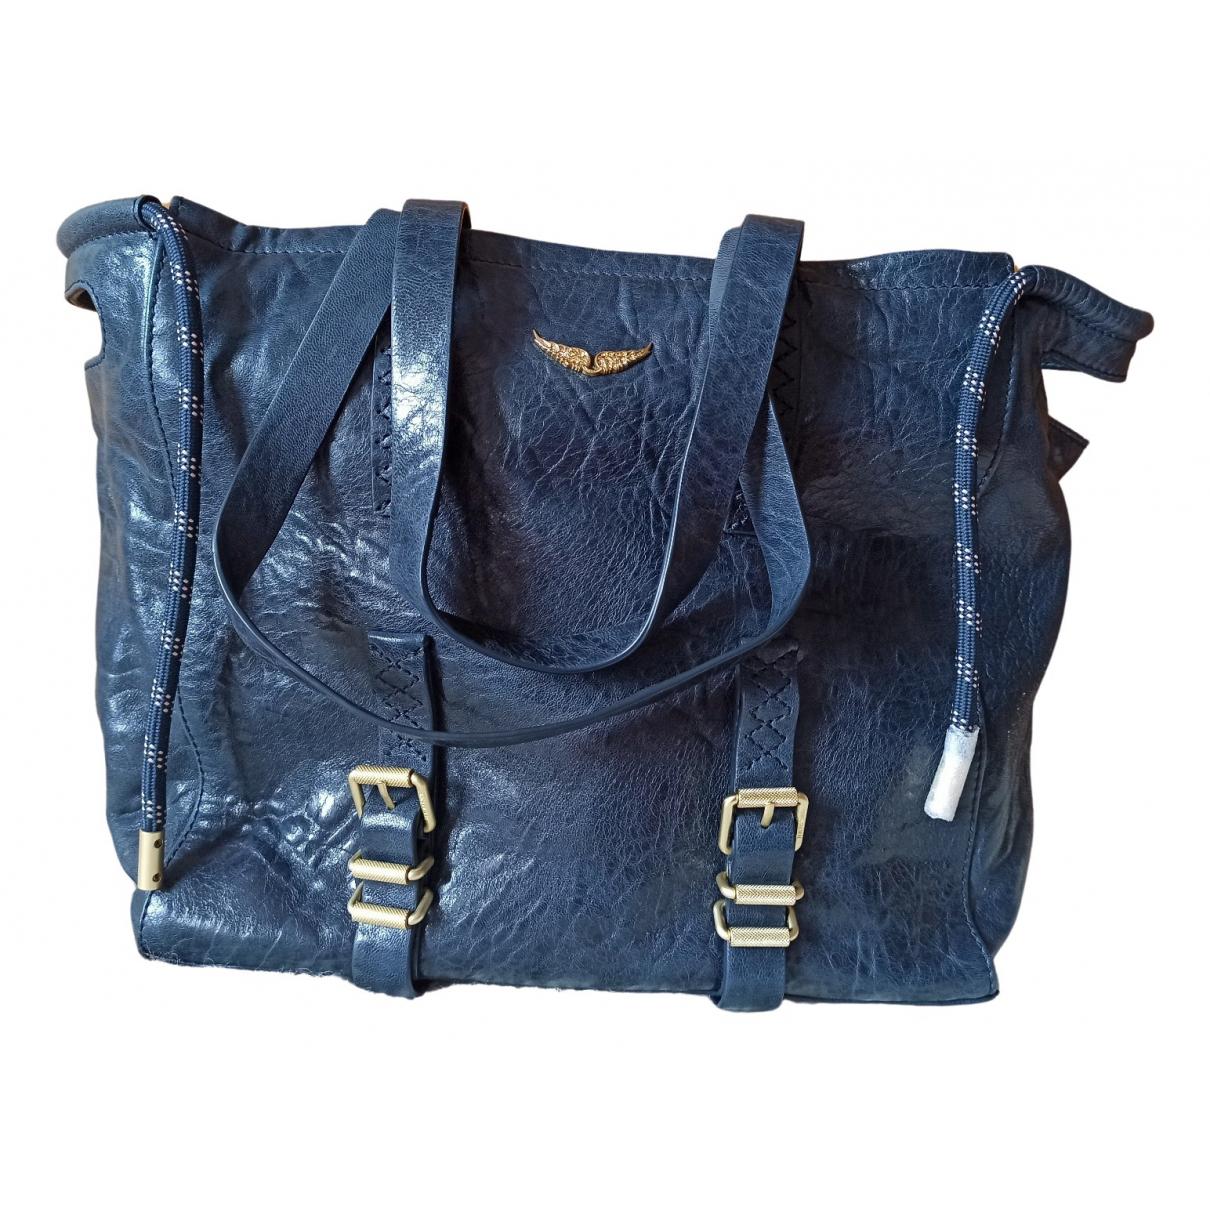 Zadig & Voltaire Fall Winter 2019 Handtasche in  Blau Leder